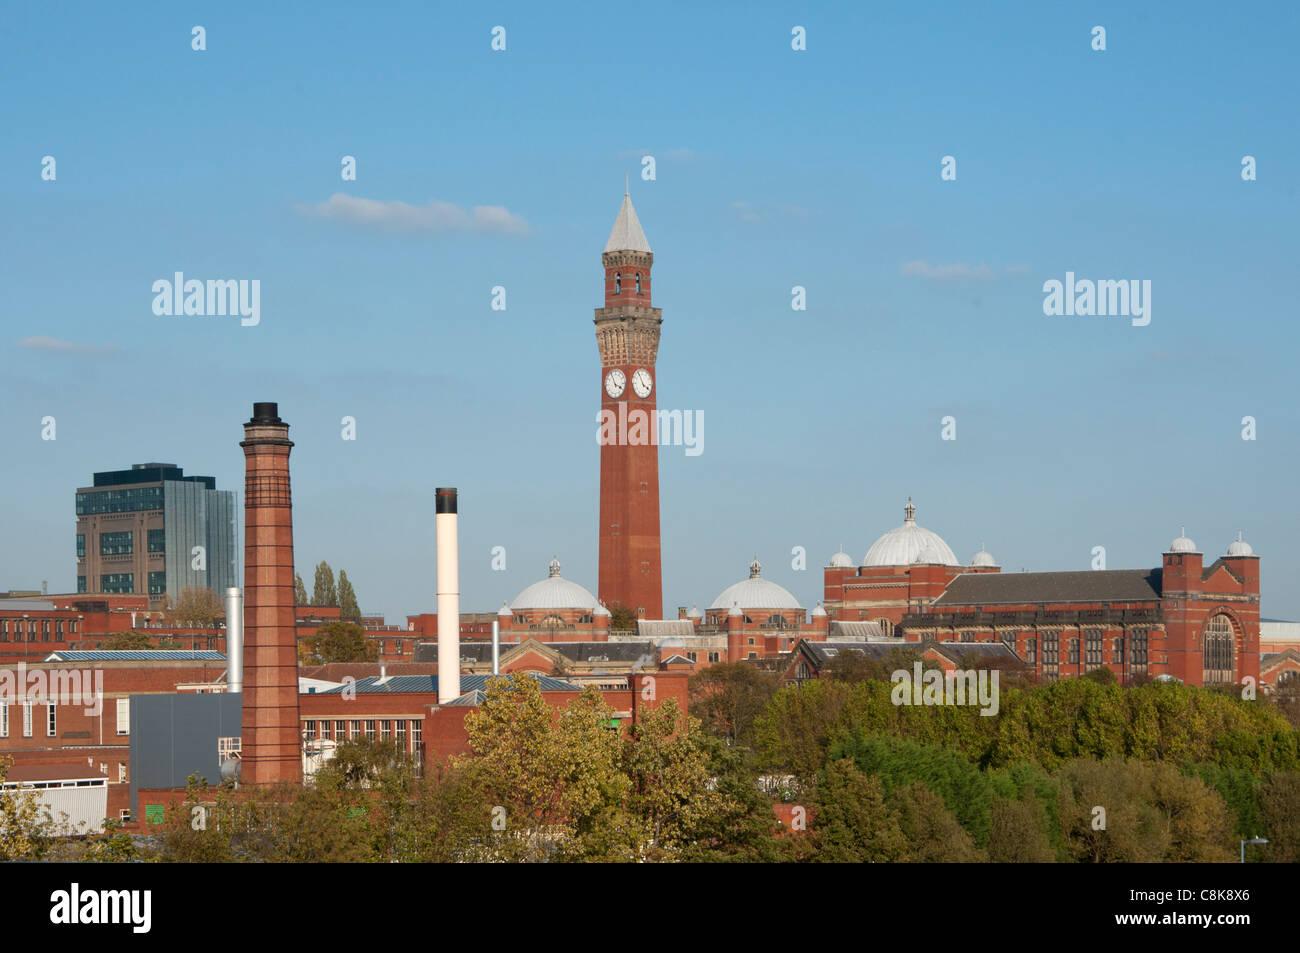 Birmingham University skyline with Joseph Chamberlain Memorial Clock Tower in Chancellor's court, Birmingham. England. Stock Photo